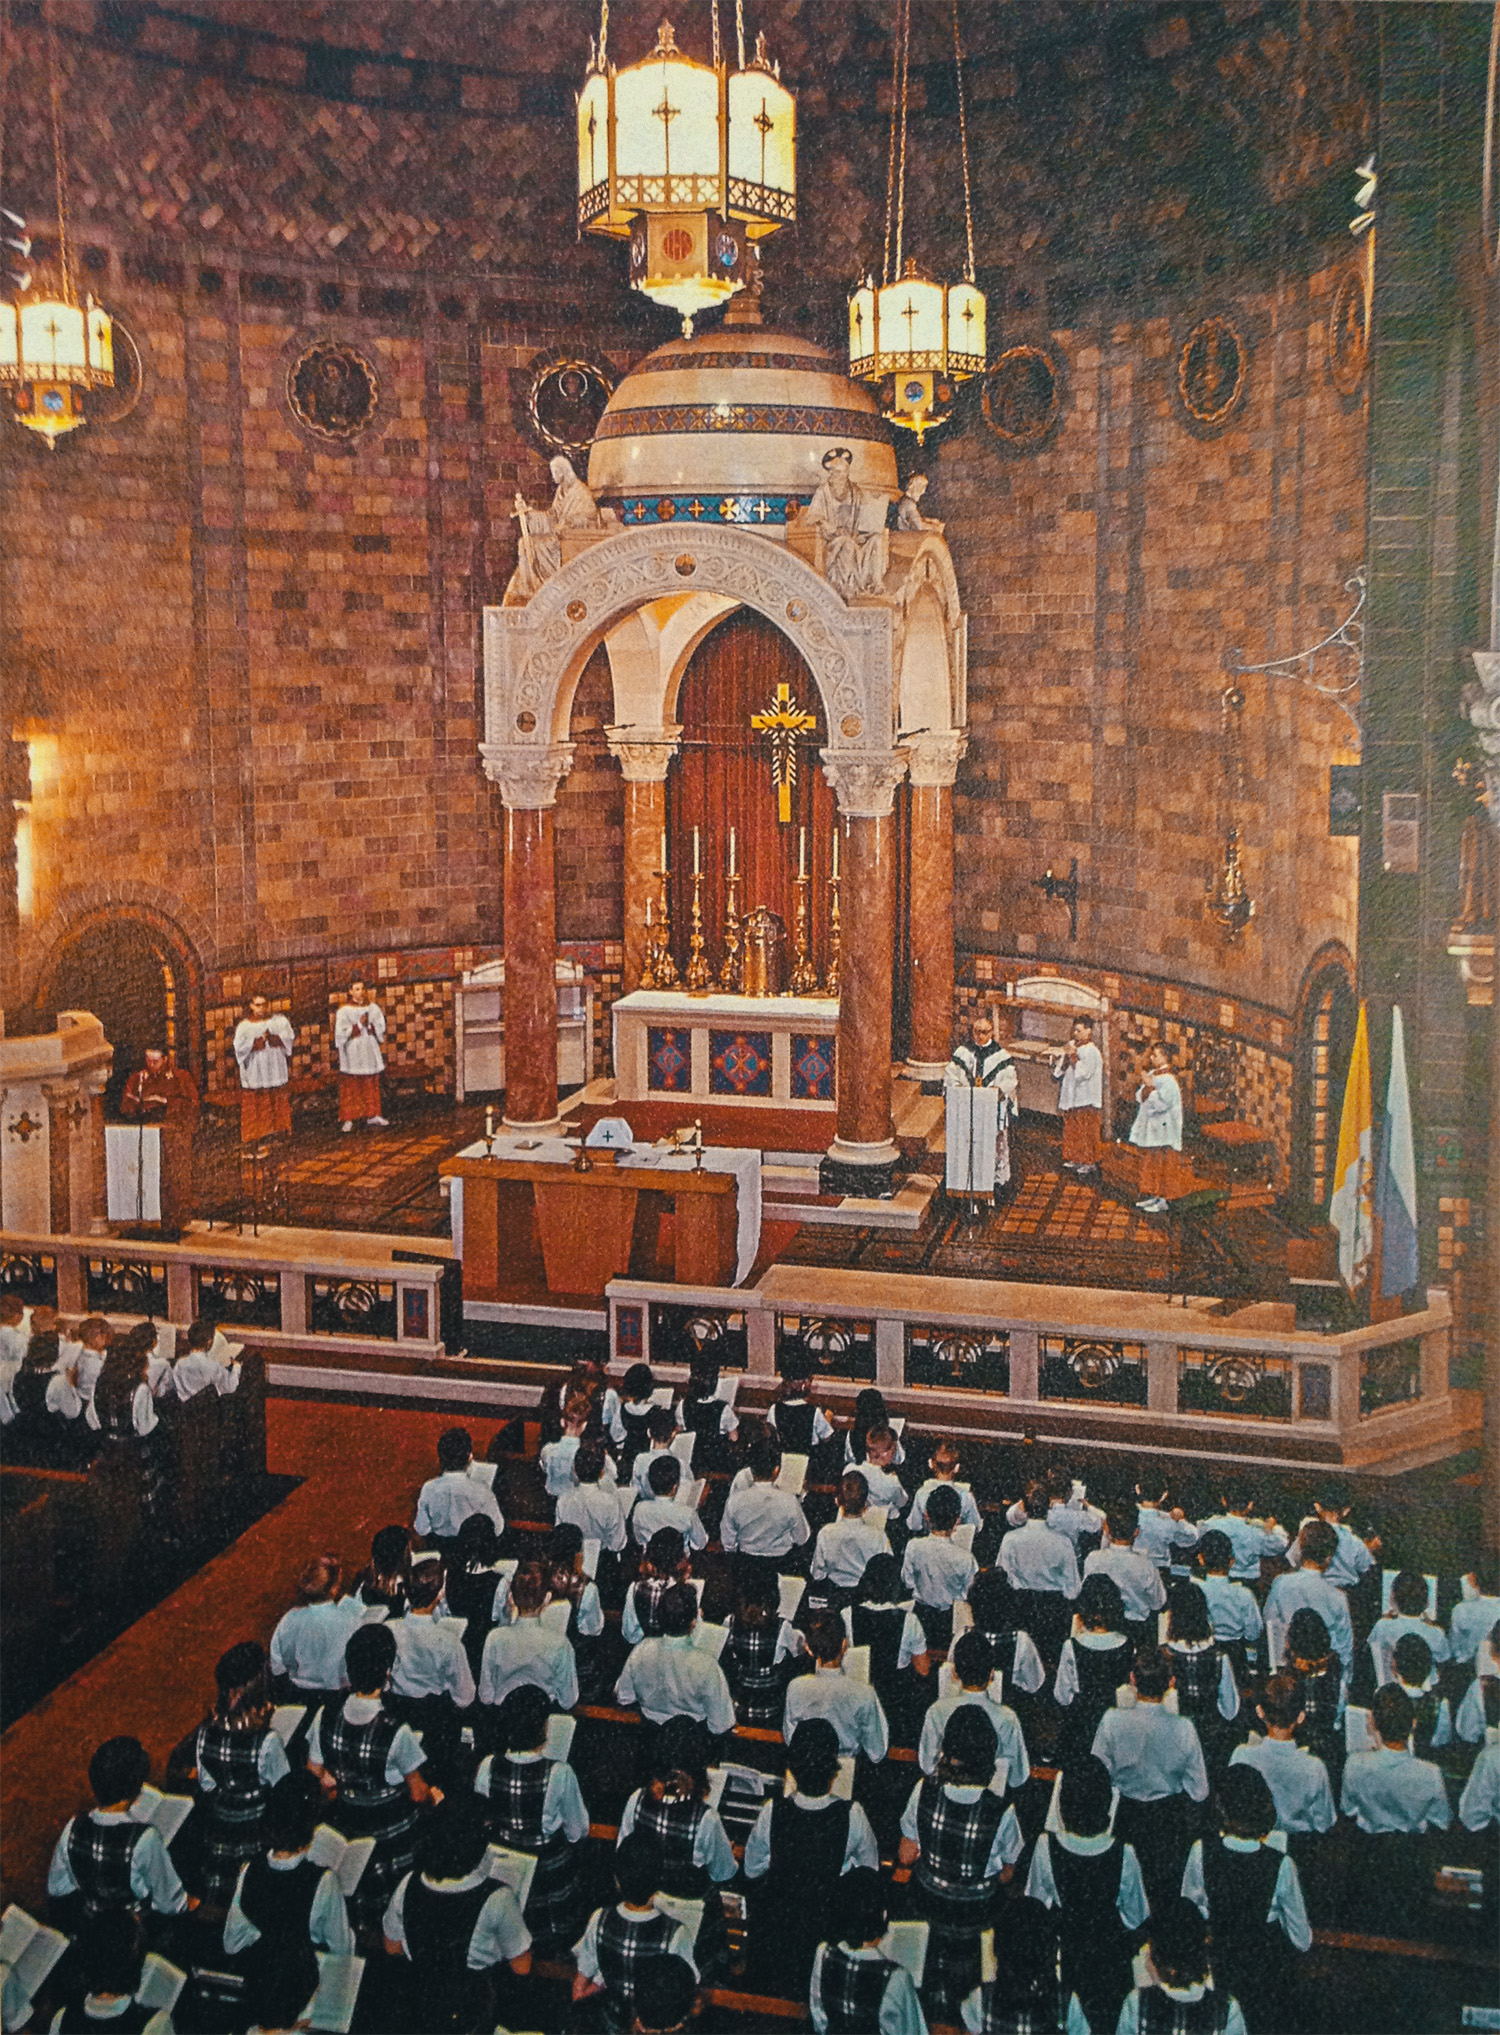 Mass circa 1965